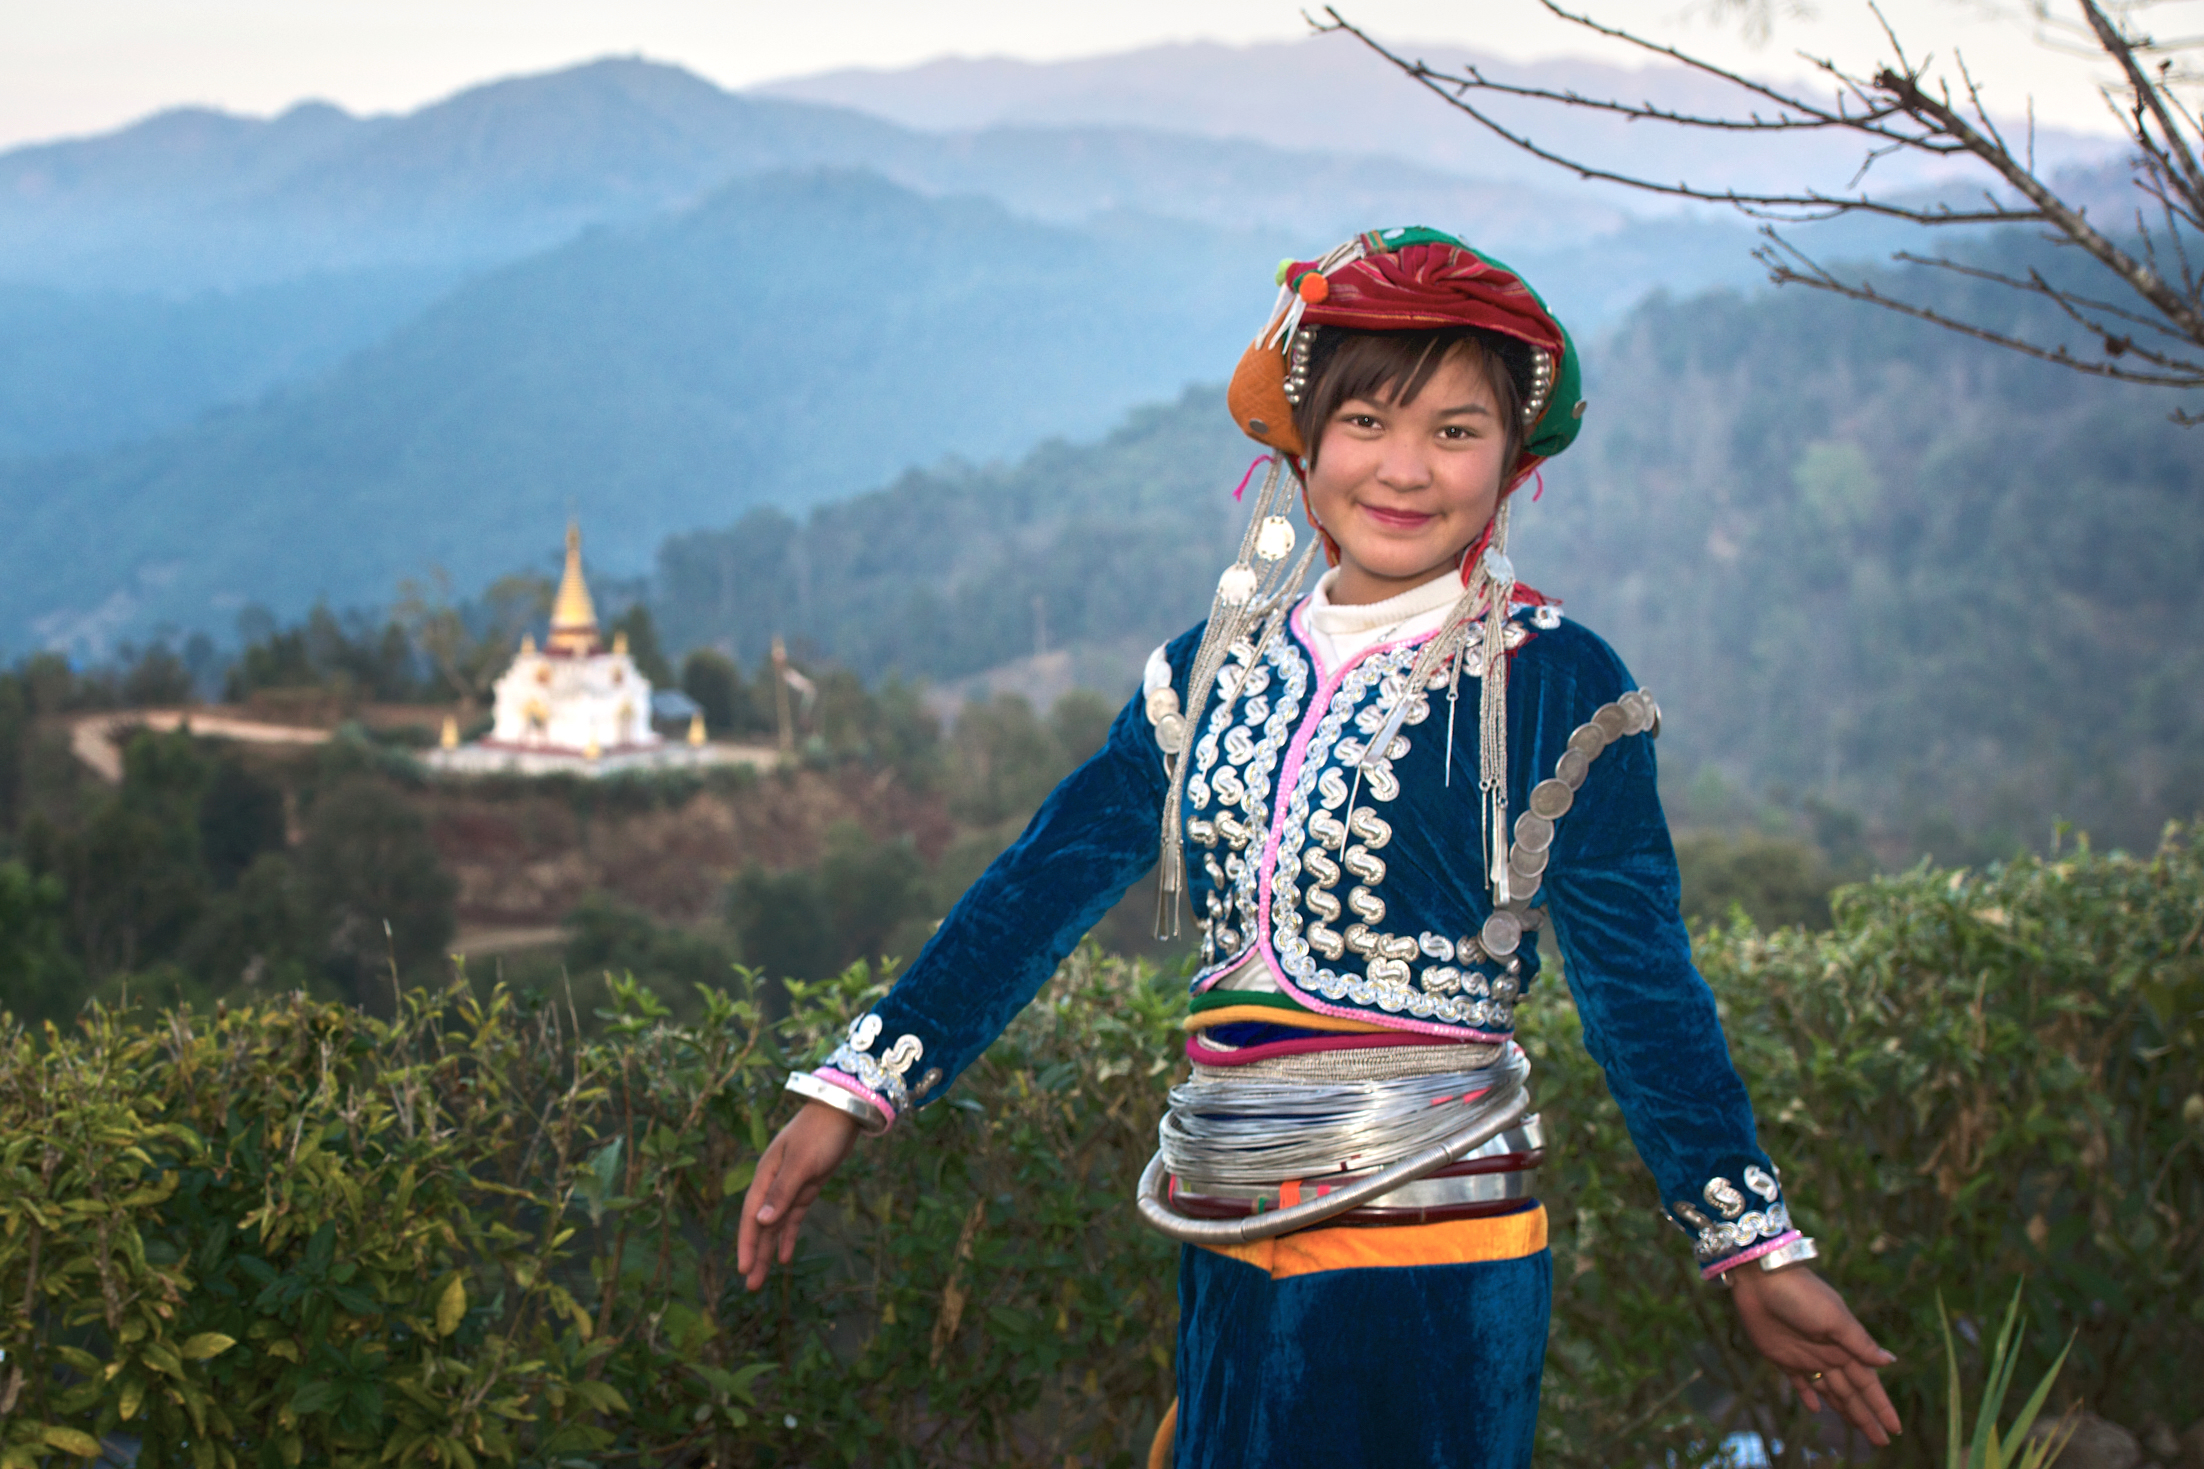 Khasar_S_DragonDress_IV_PansariVillage_ShanState_Myanmar_Winter_2013.jpg